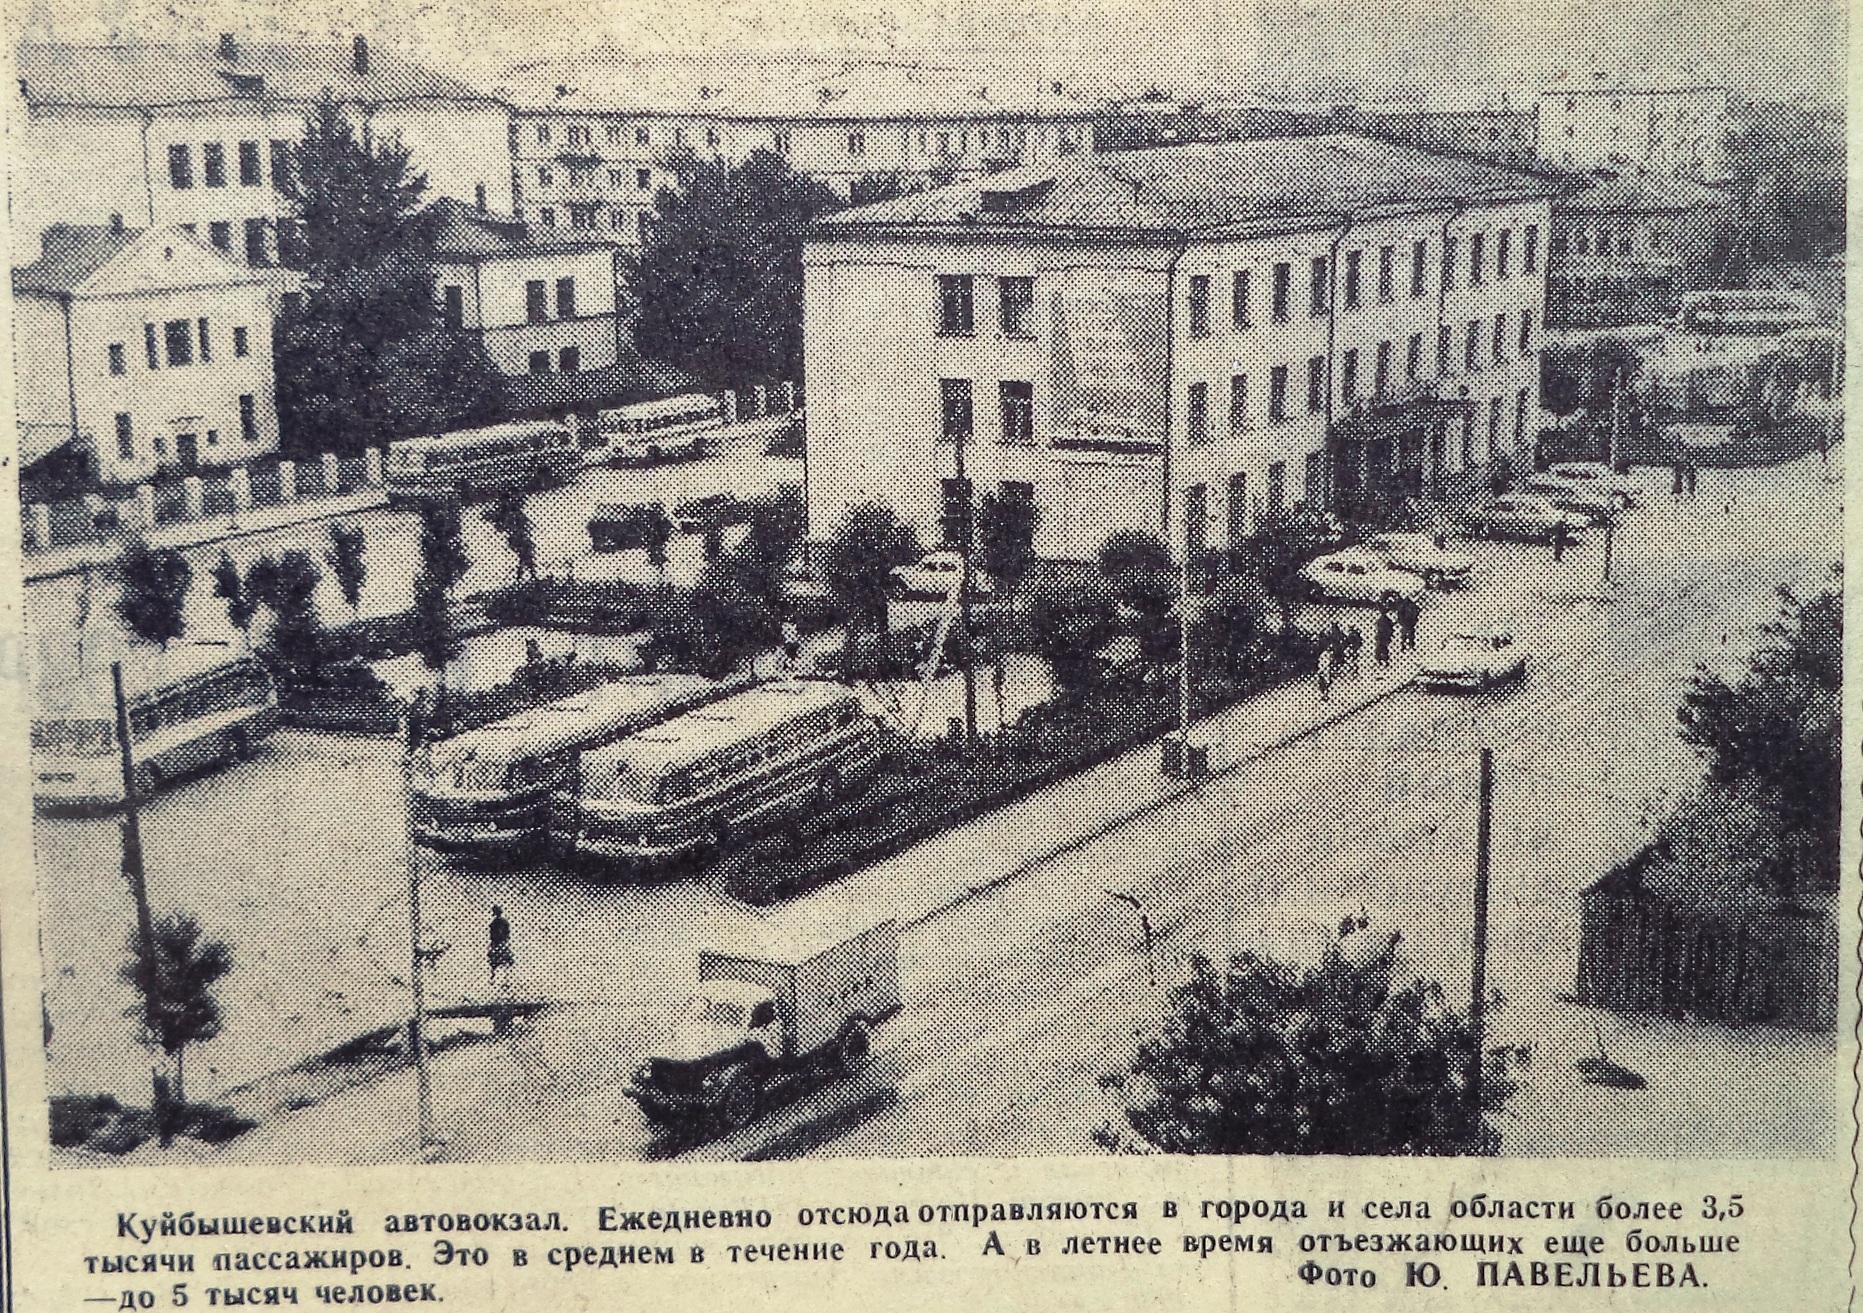 ПАВ-ФОТО-10-Автотранспортник-1967-28 октября-1